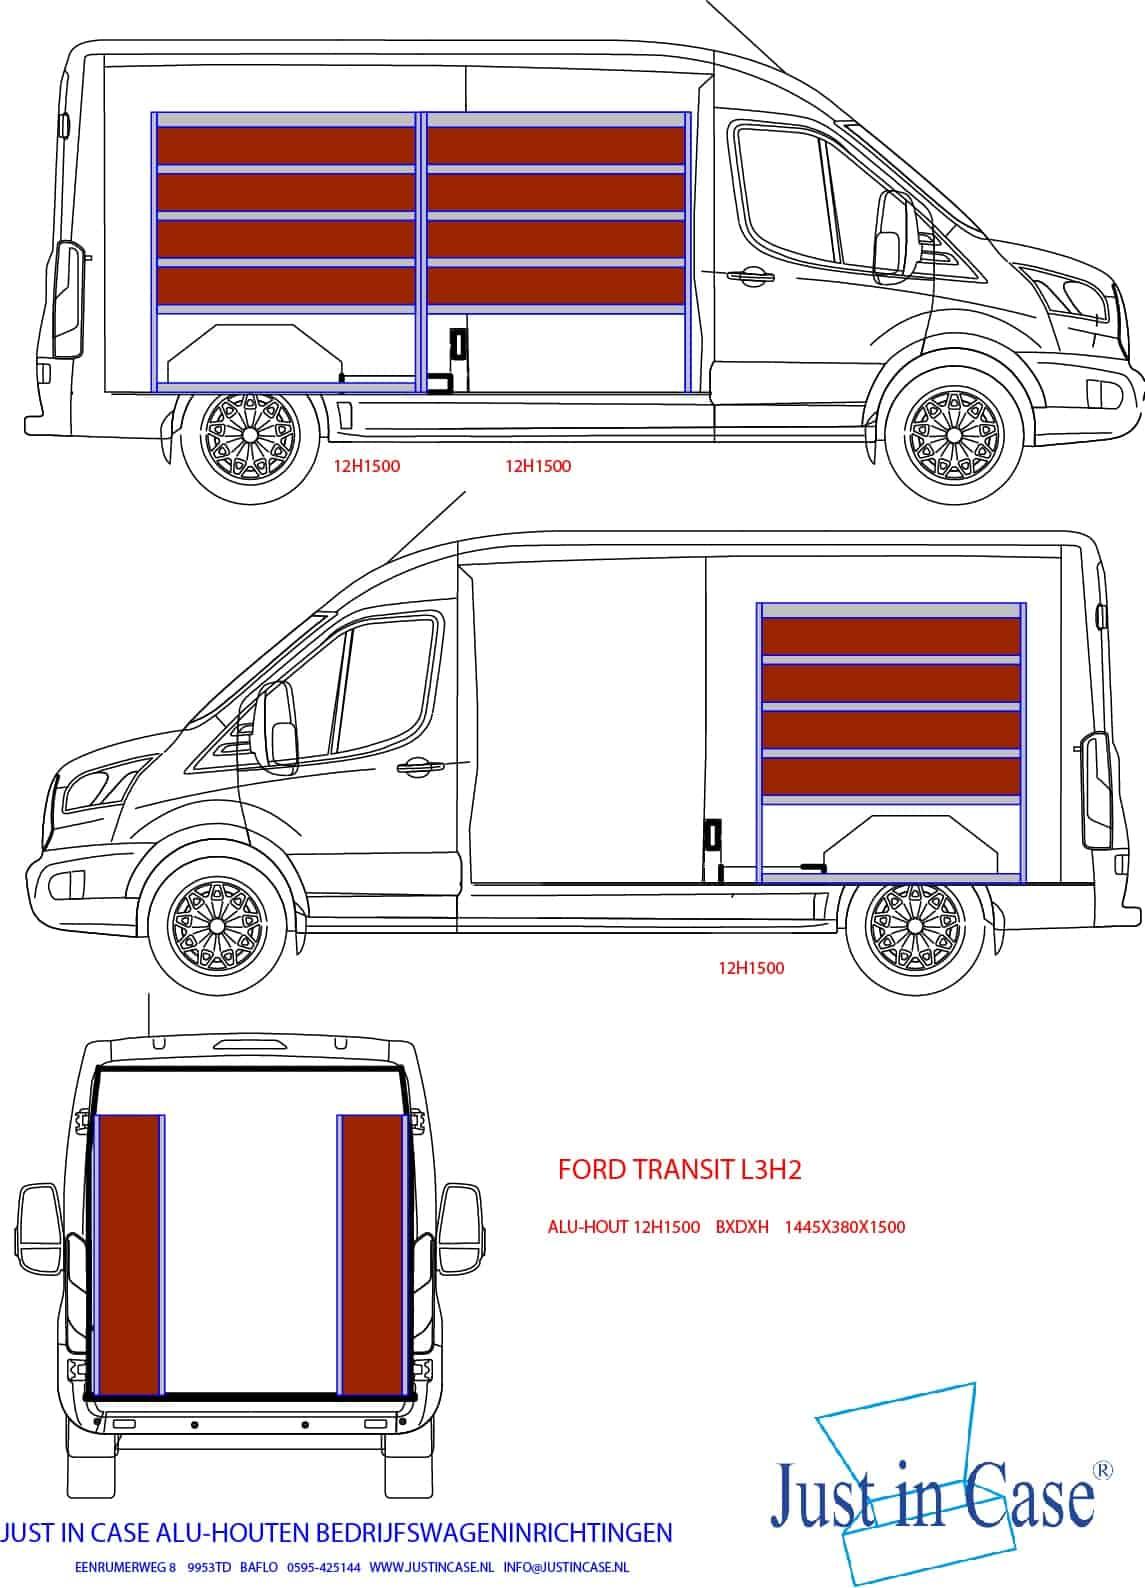 Ford Transit bedrijfswageninrichting